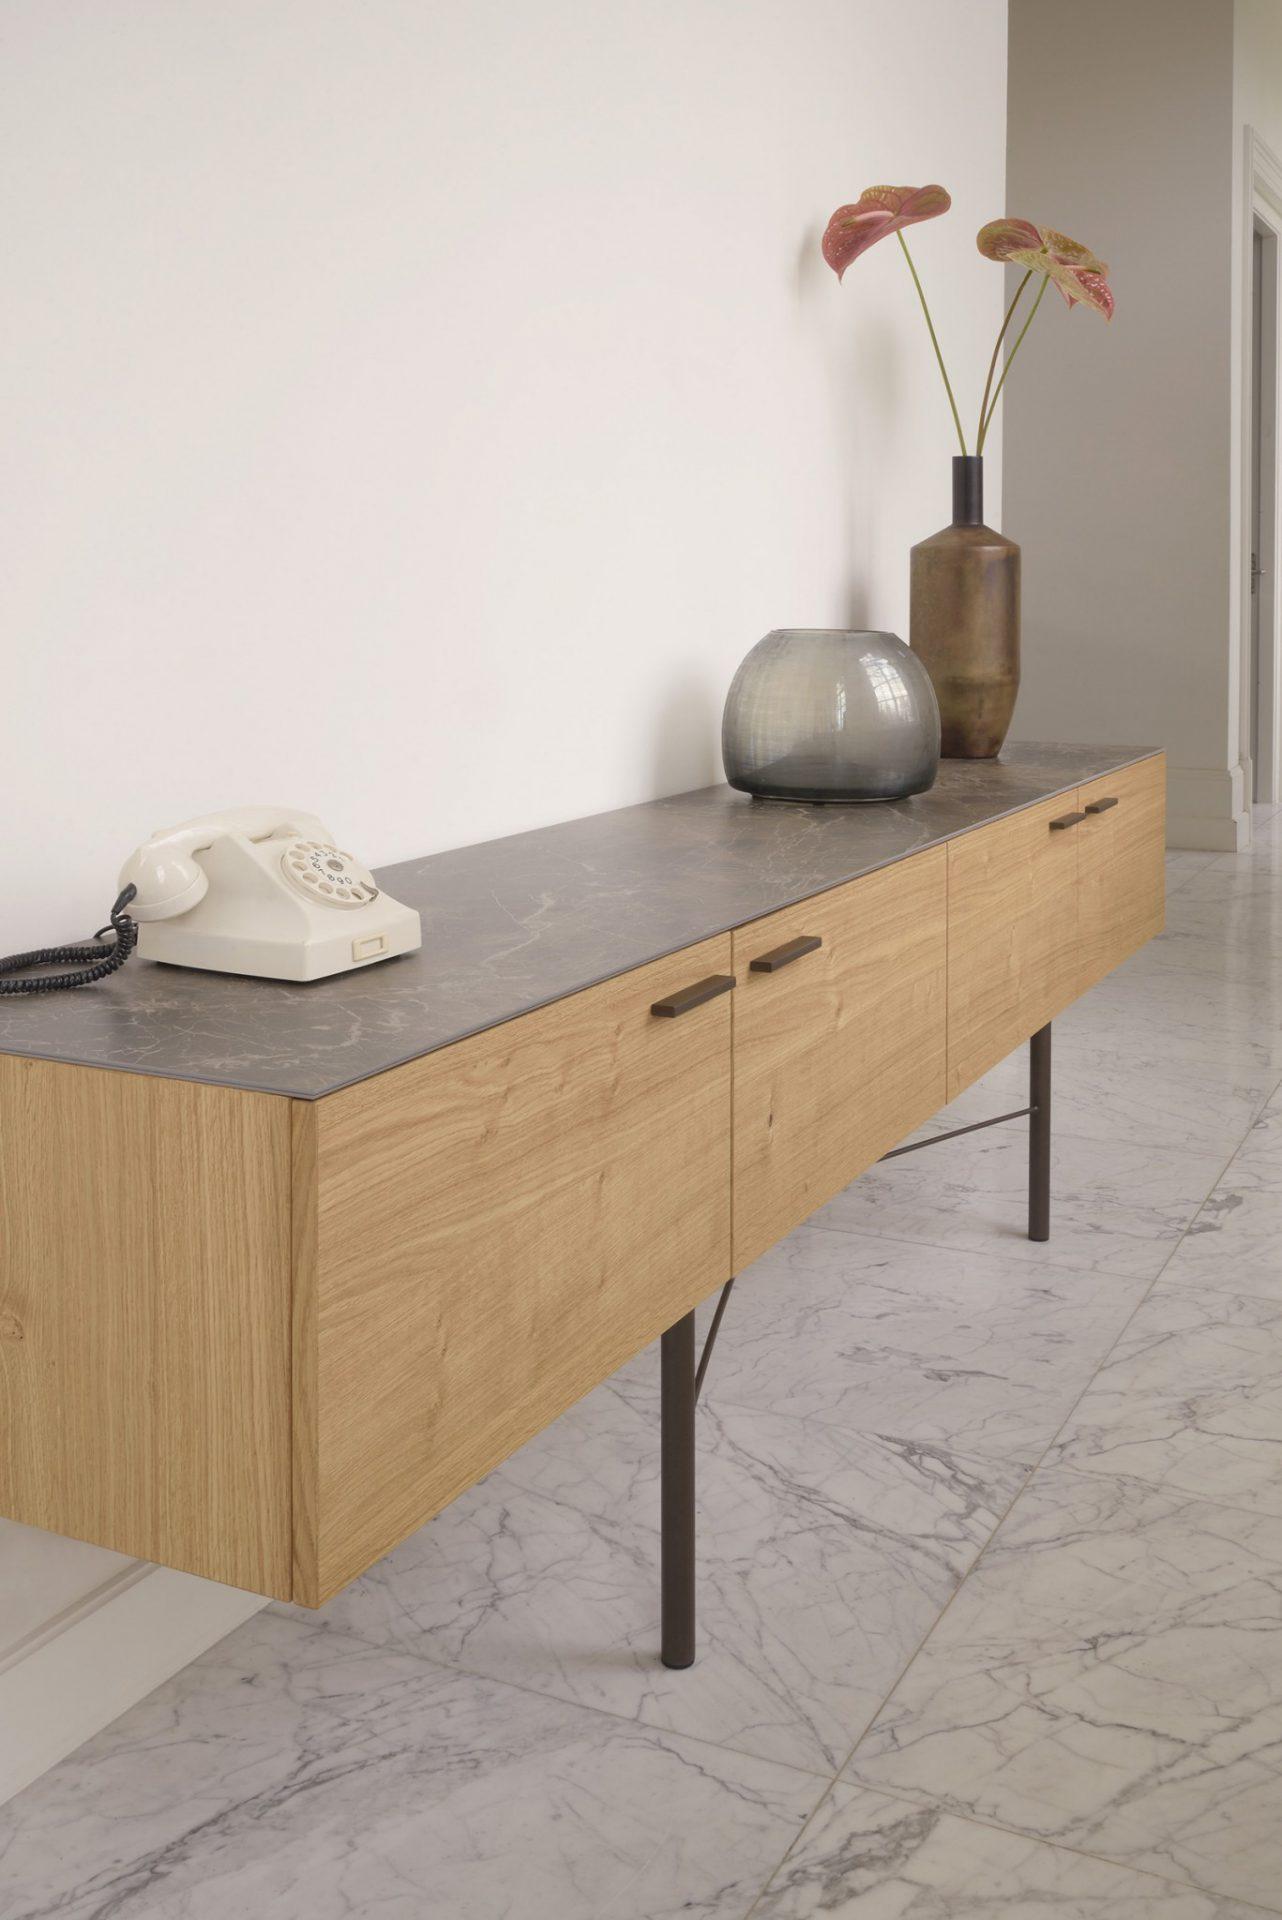 Subliem afgewerkt tijdloos Ceder dressoir van Brown by Bert Plantagie